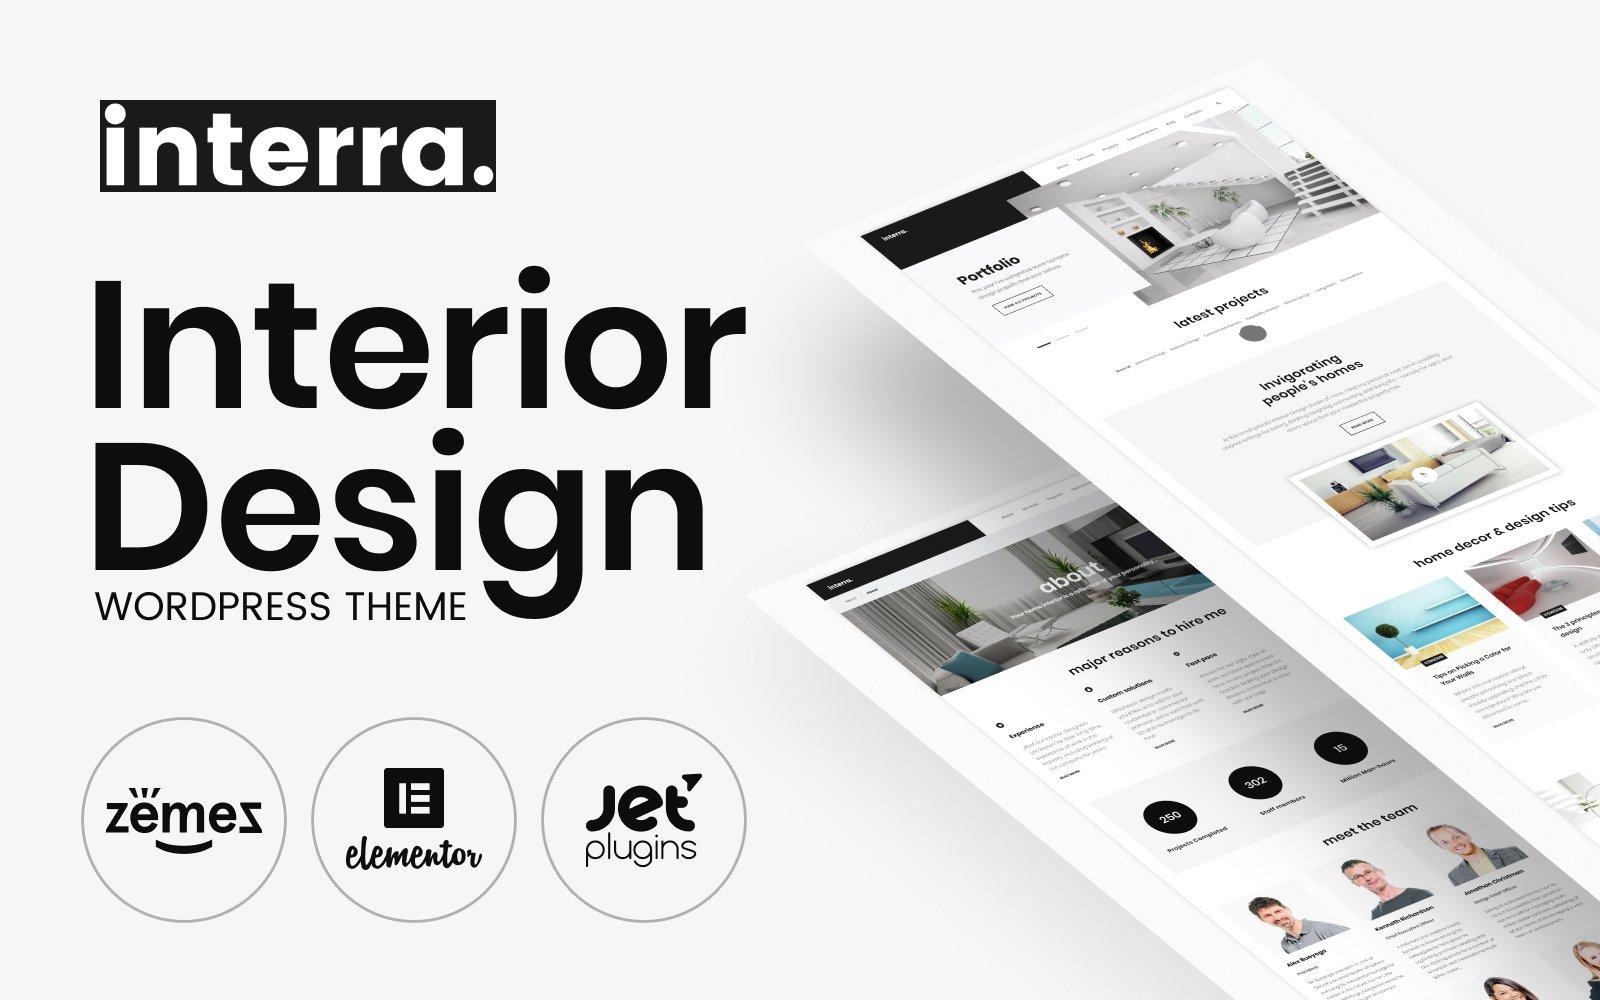 Responsywny motyw WordPress Interra - Interior Designer Portfolio #62042